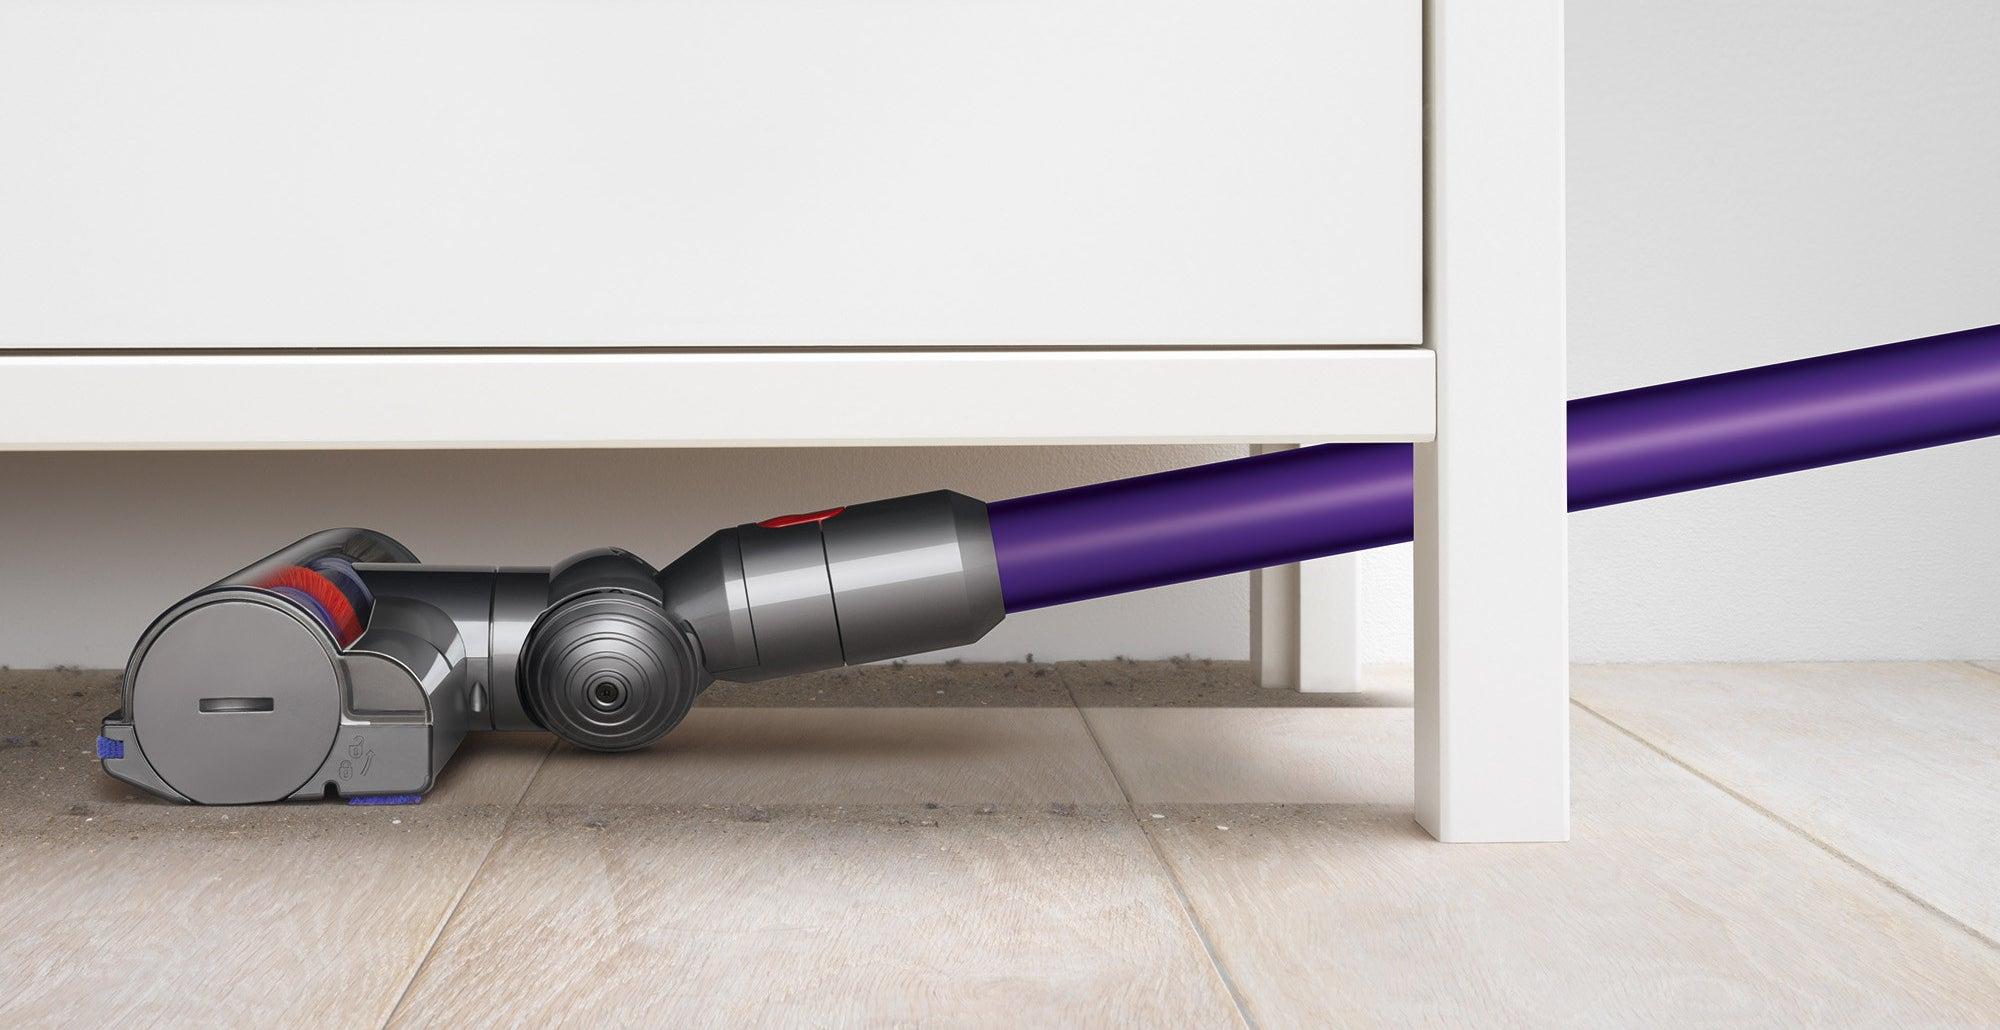 The vacuum reaches under a dresser